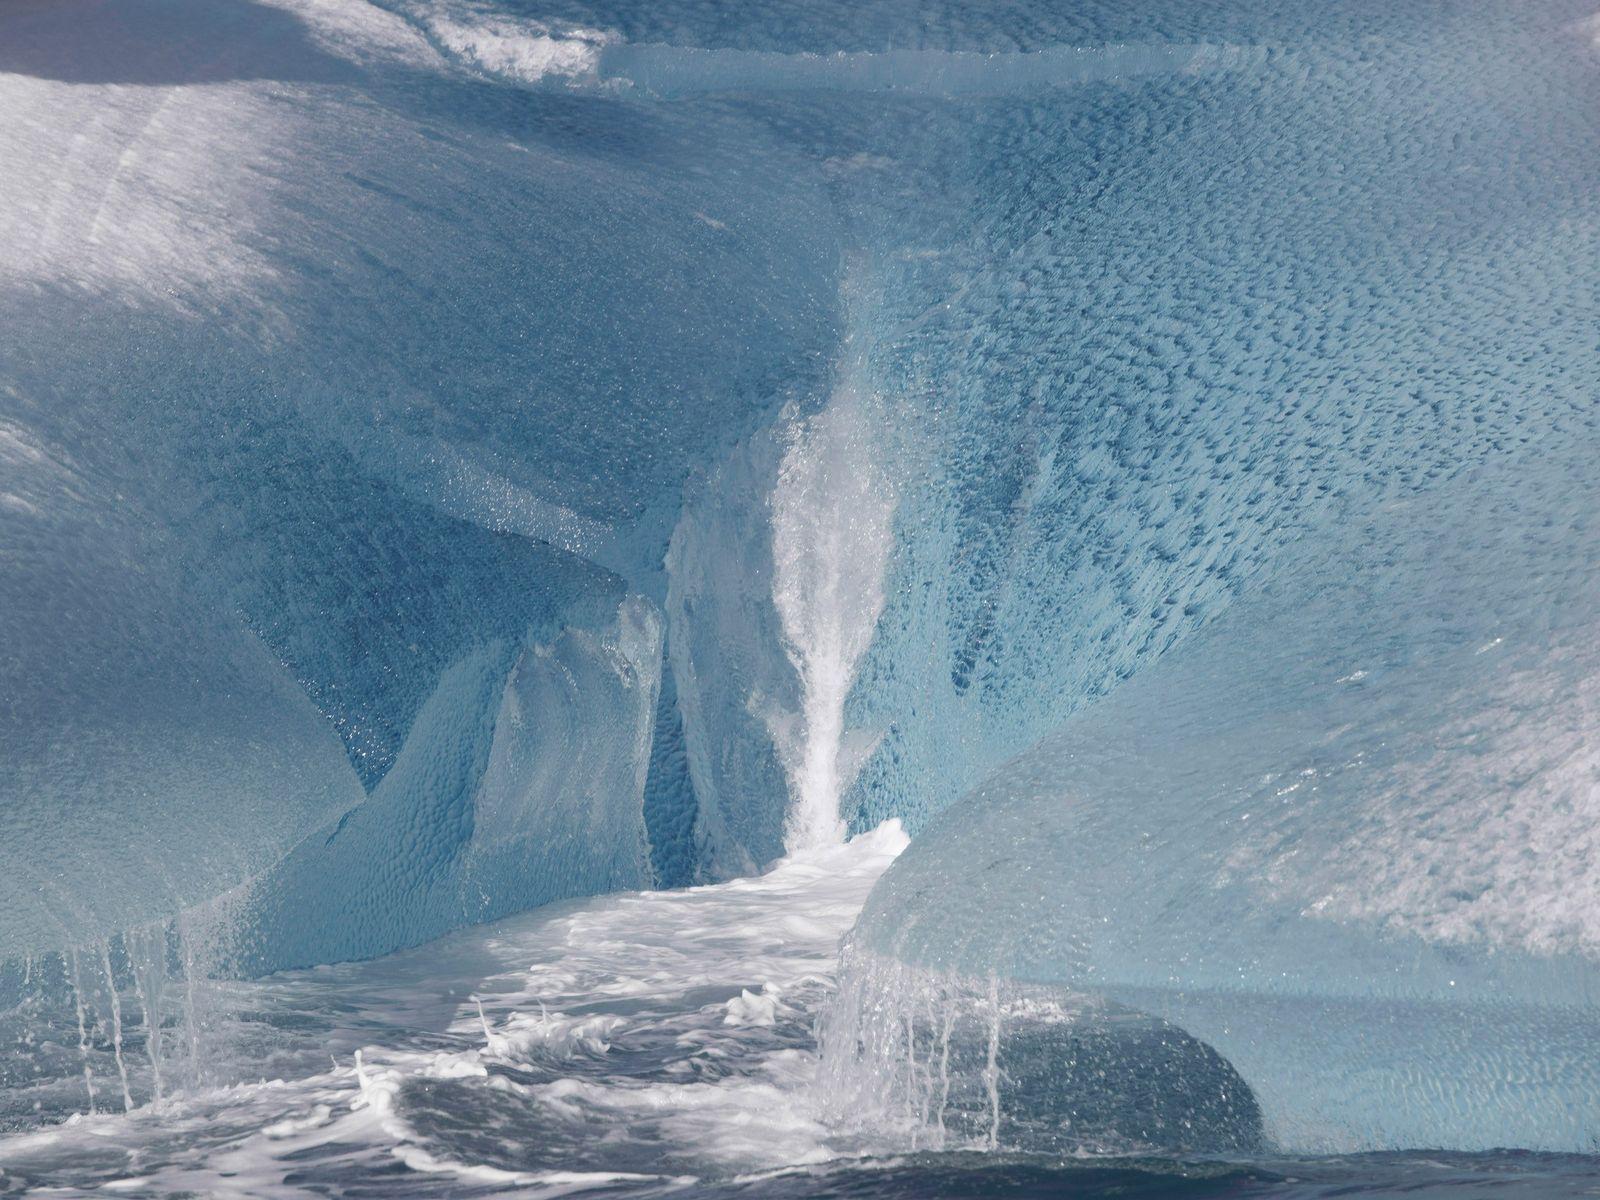 Un iceberg en Groenlandia